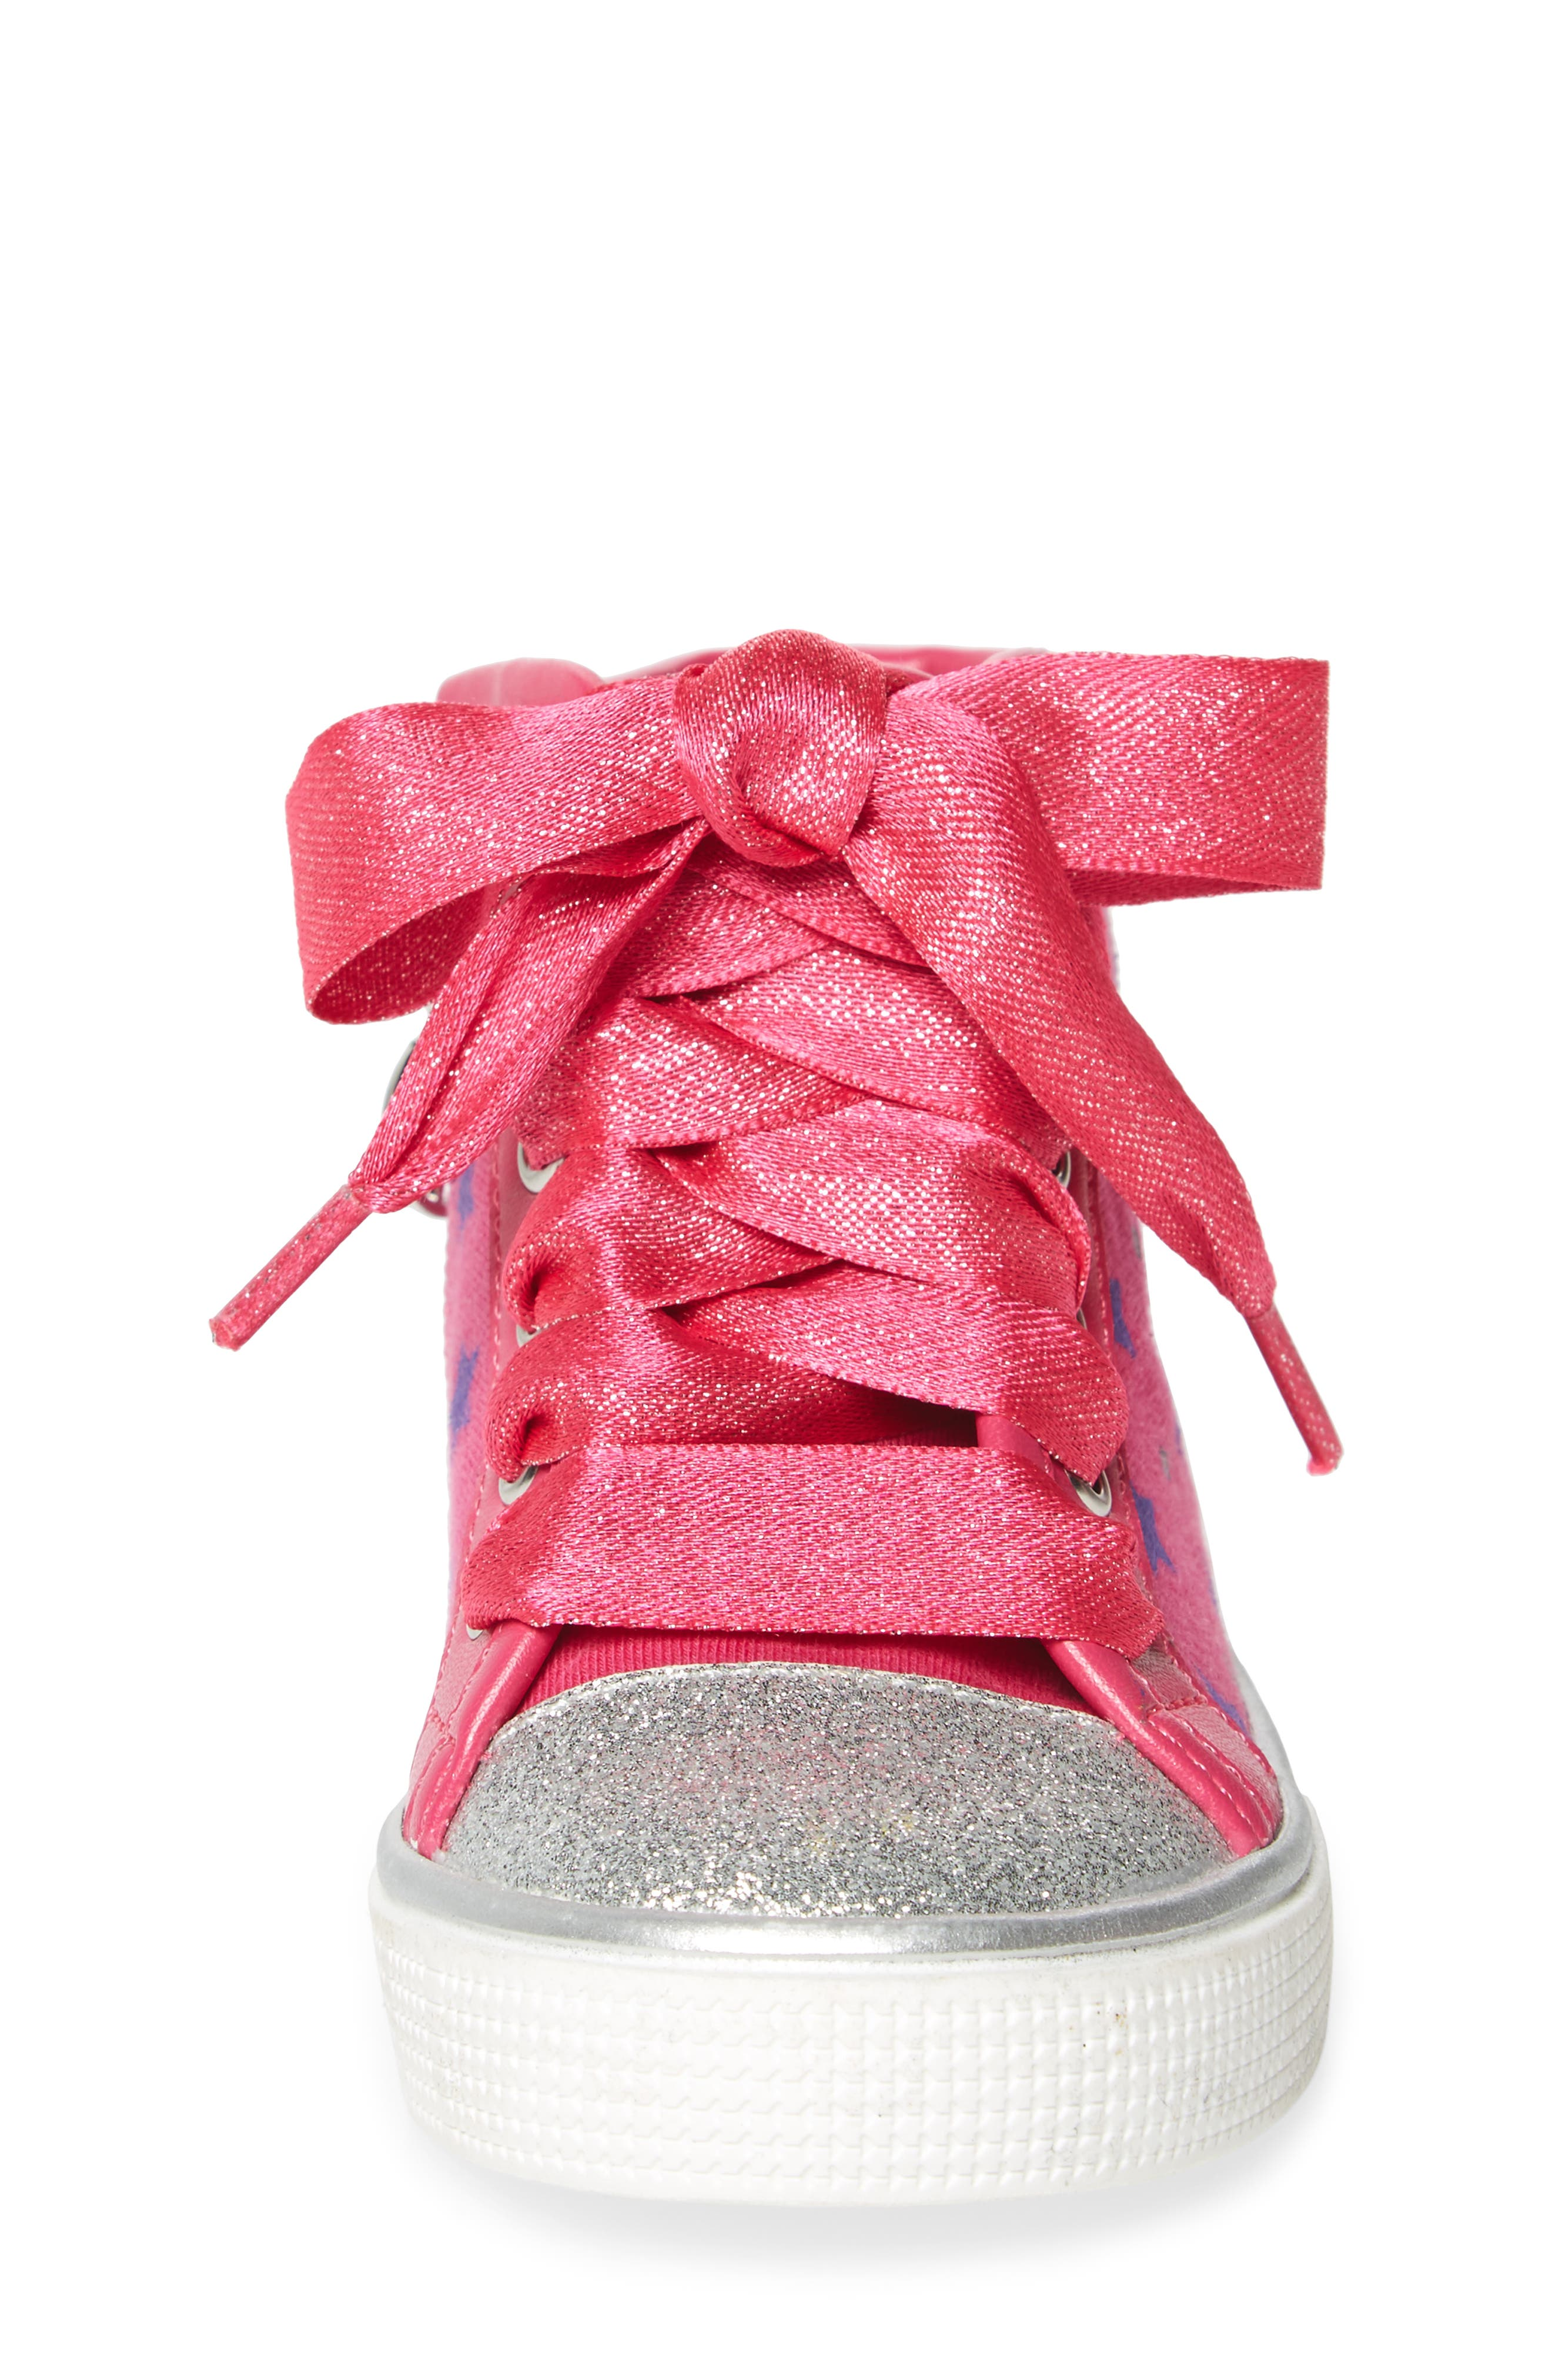 Emerson High Top Sneaker,                             Alternate thumbnail 4, color,                             Pink/ Purple